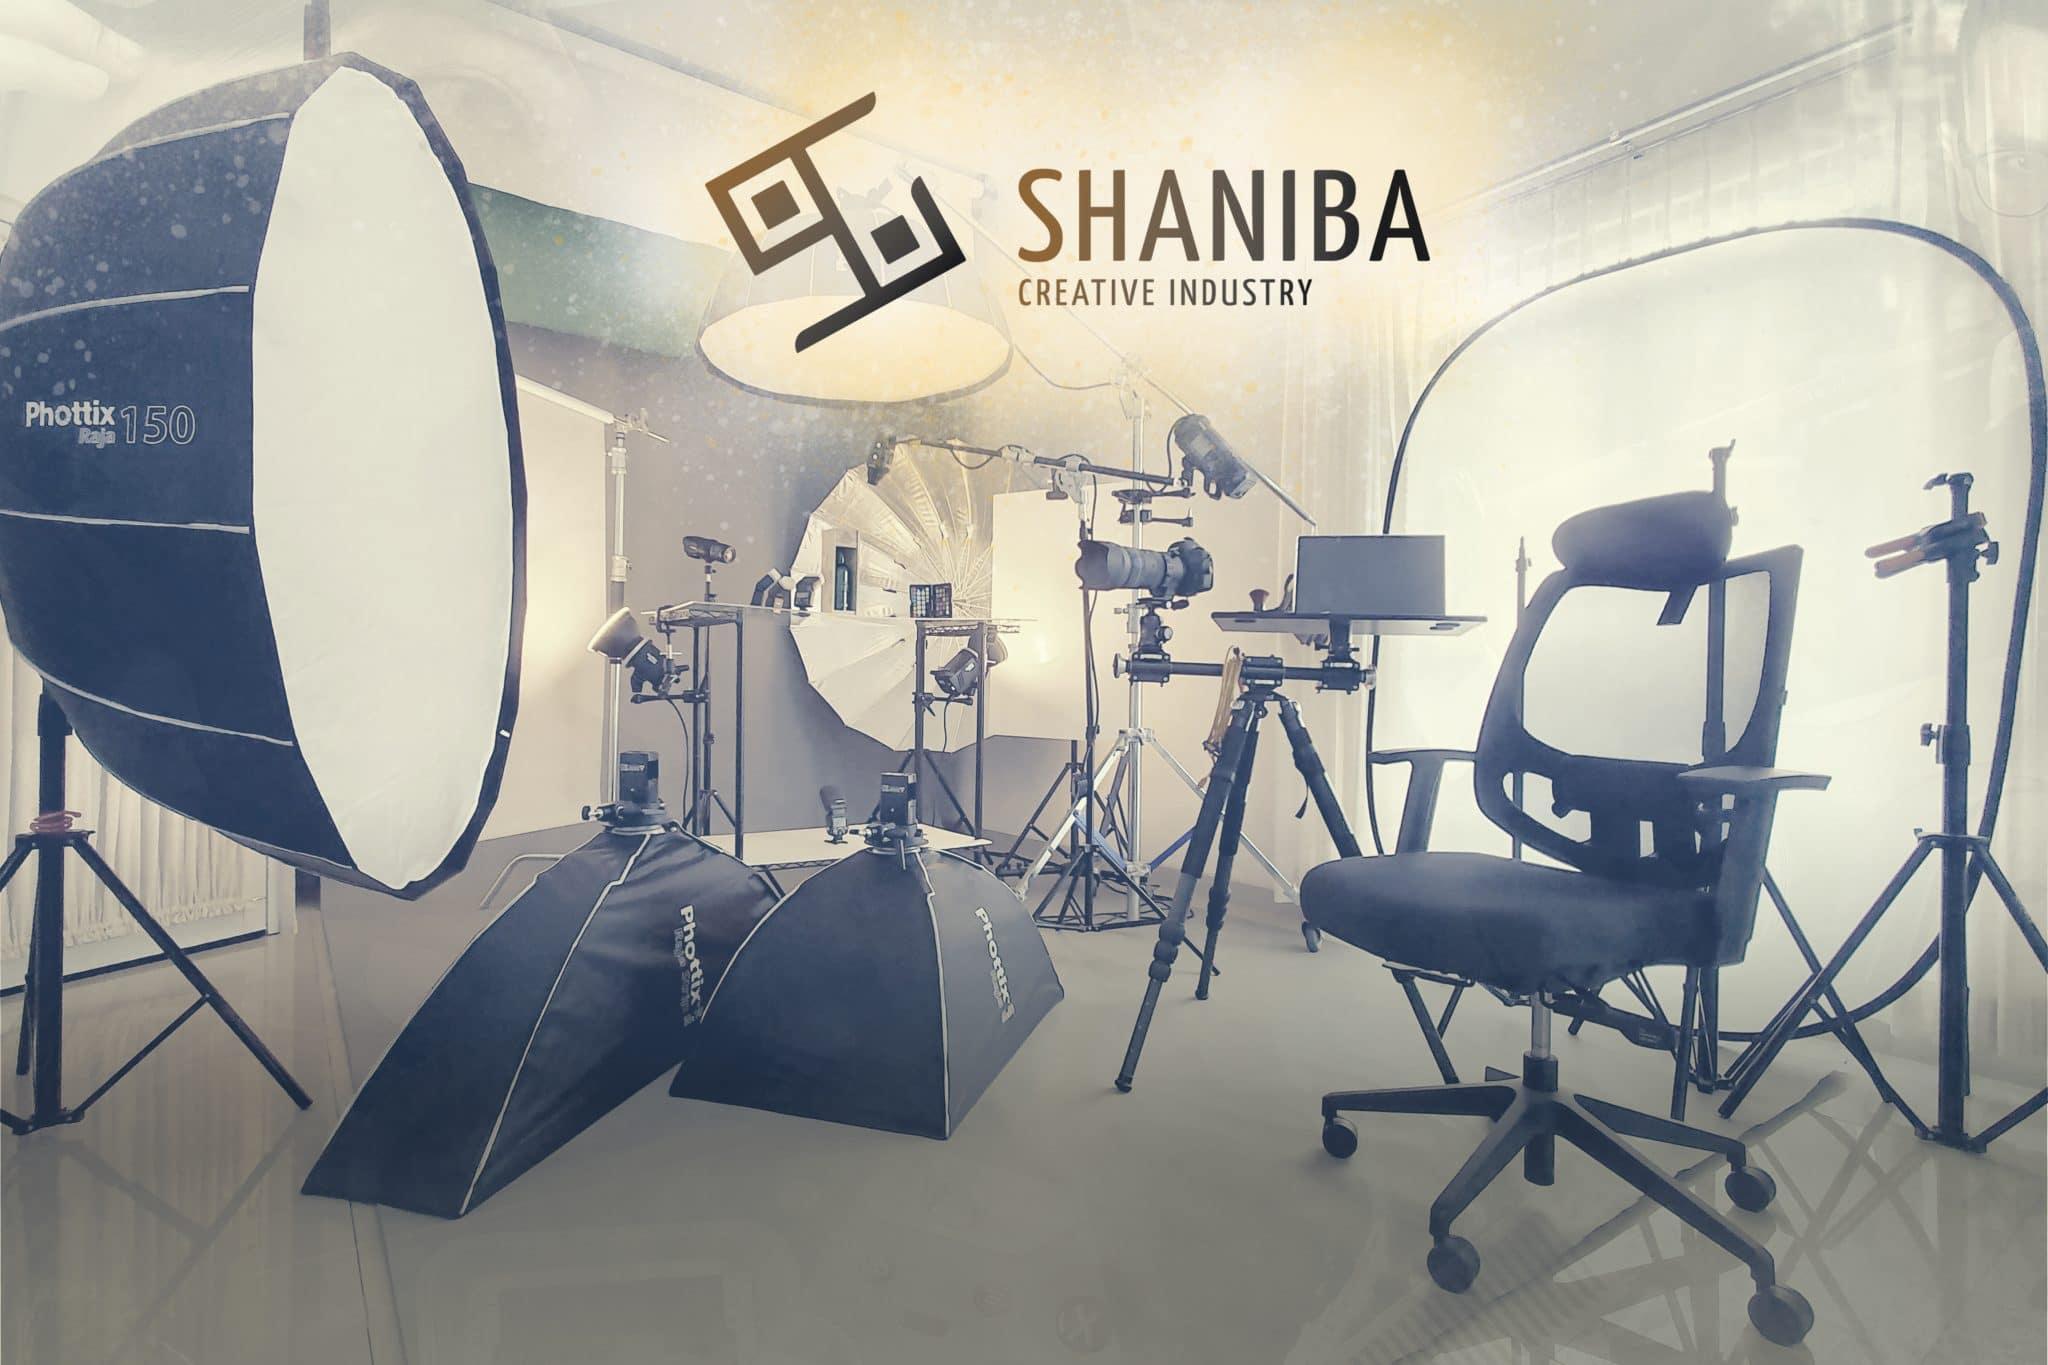 Jasa Fotografi Profesional - Shaniba Creative Industry